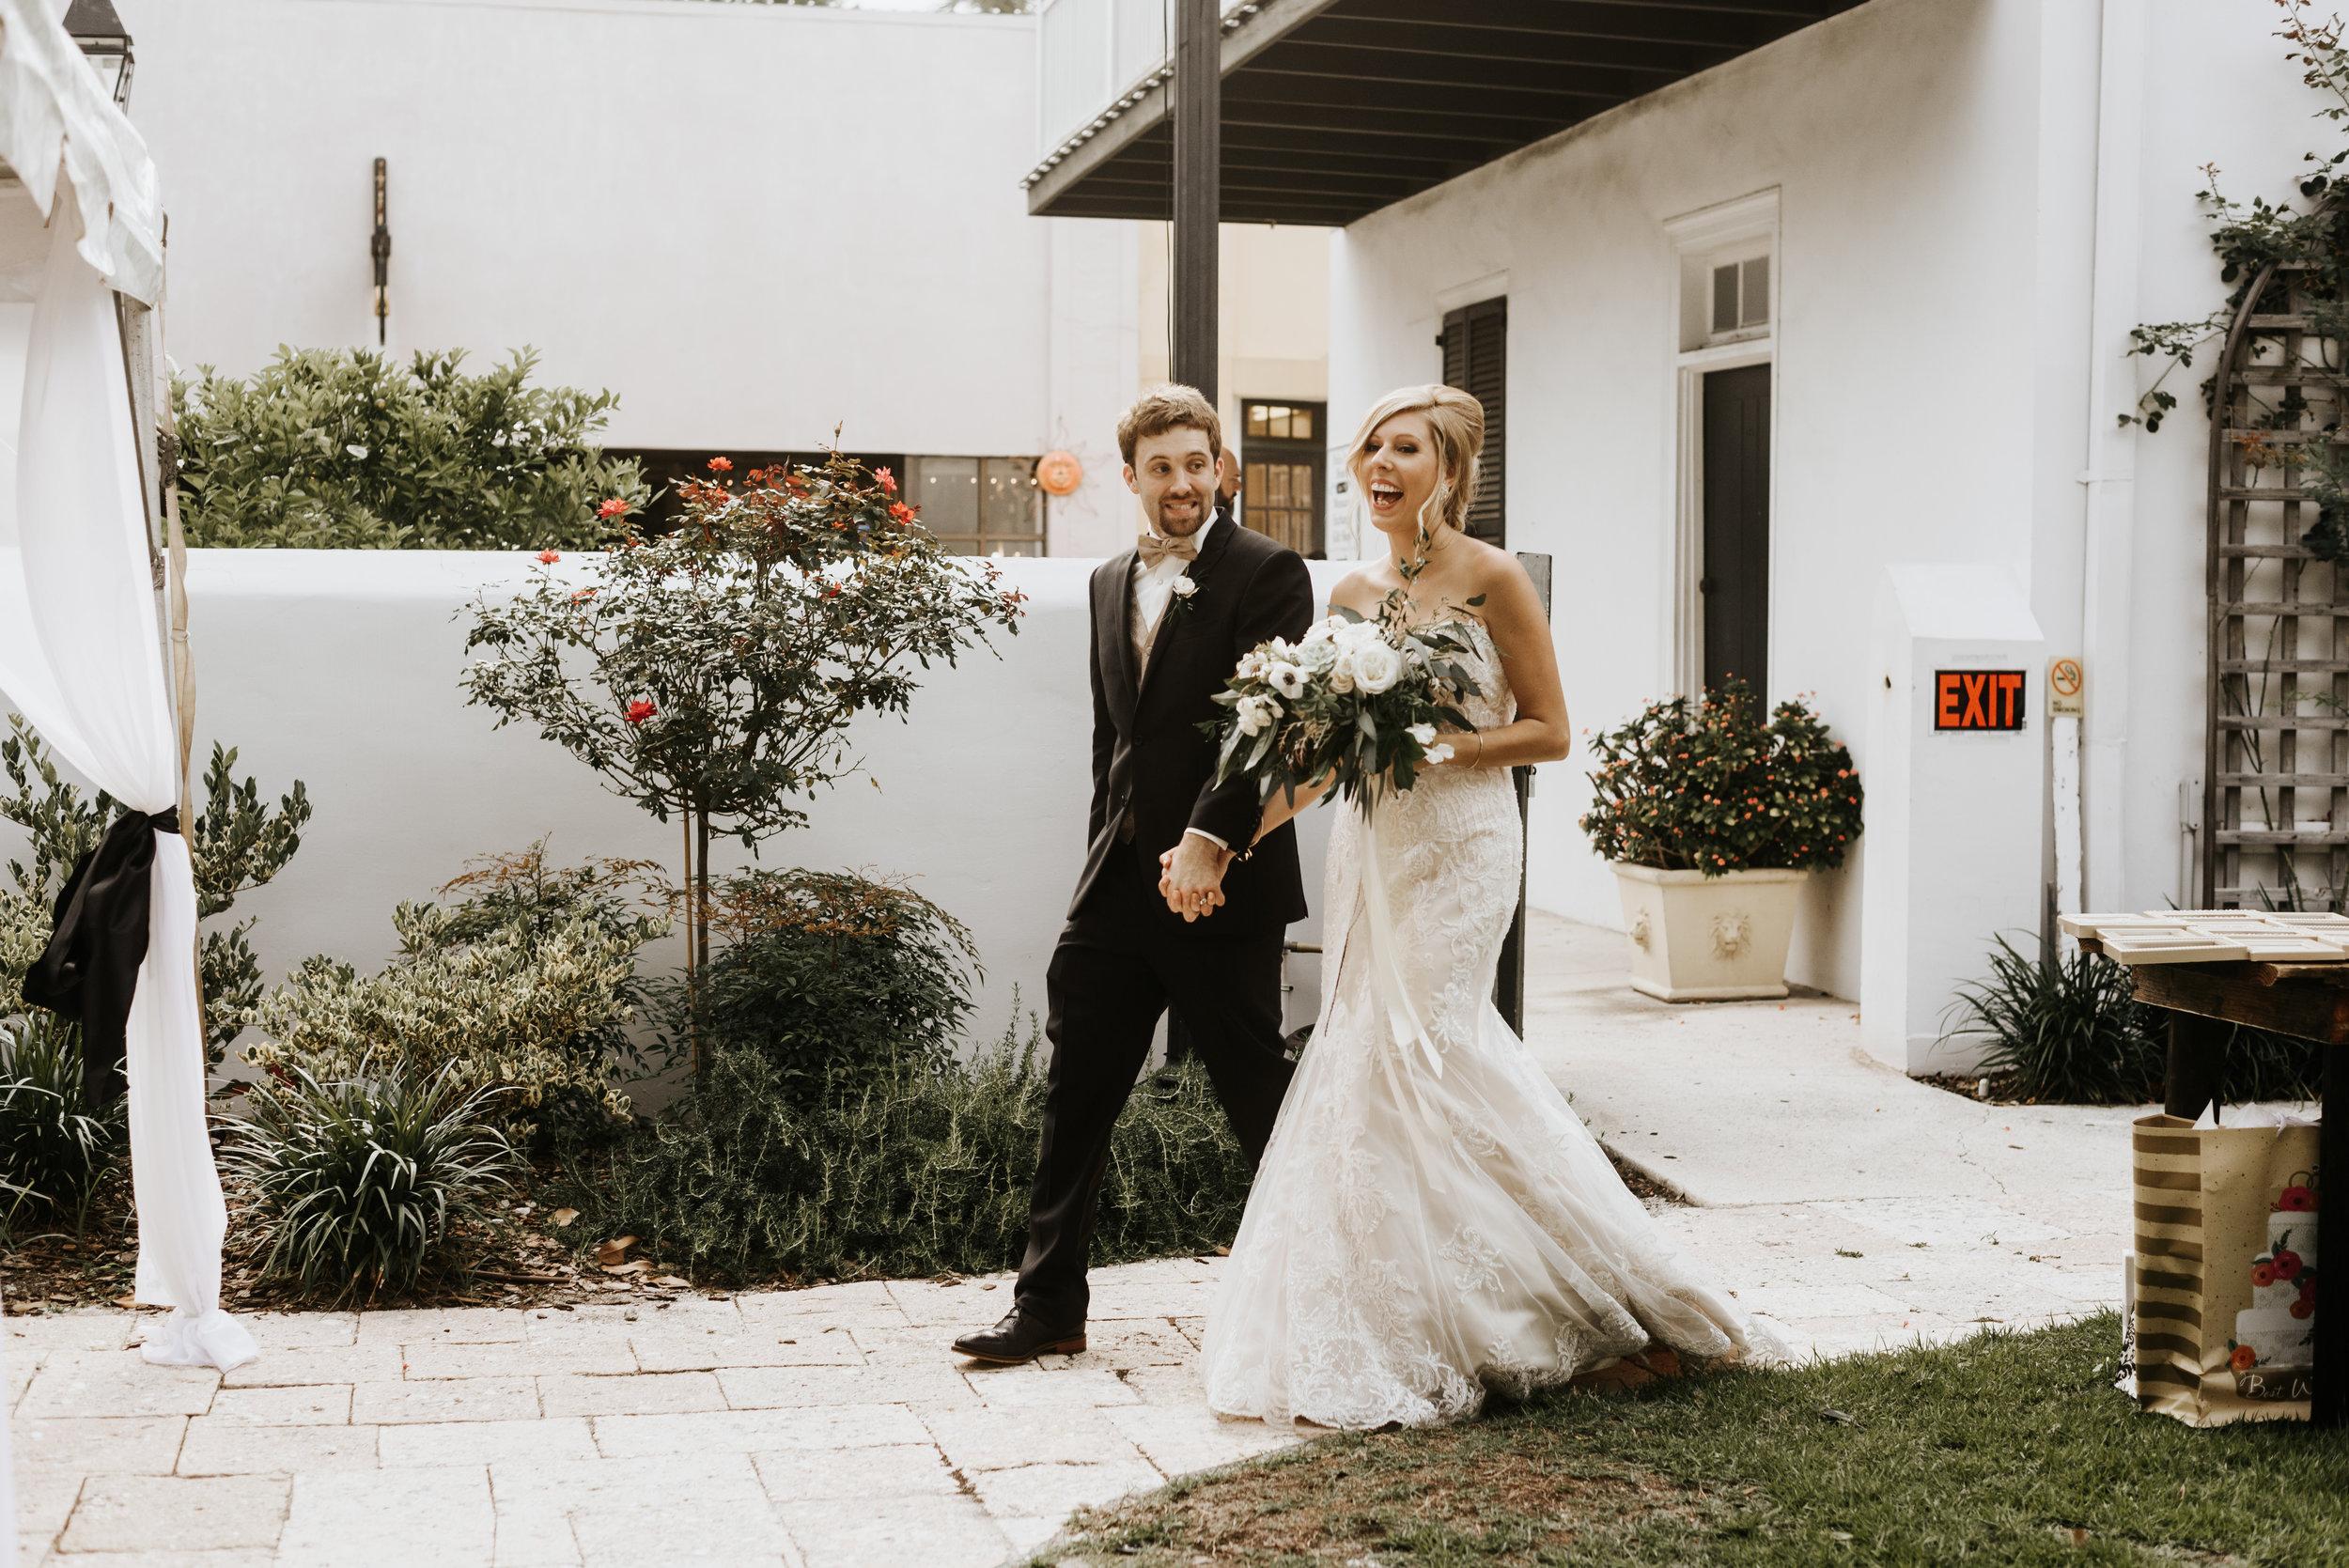 Mandy-Brad-Wedding-Previews-2963.jpg